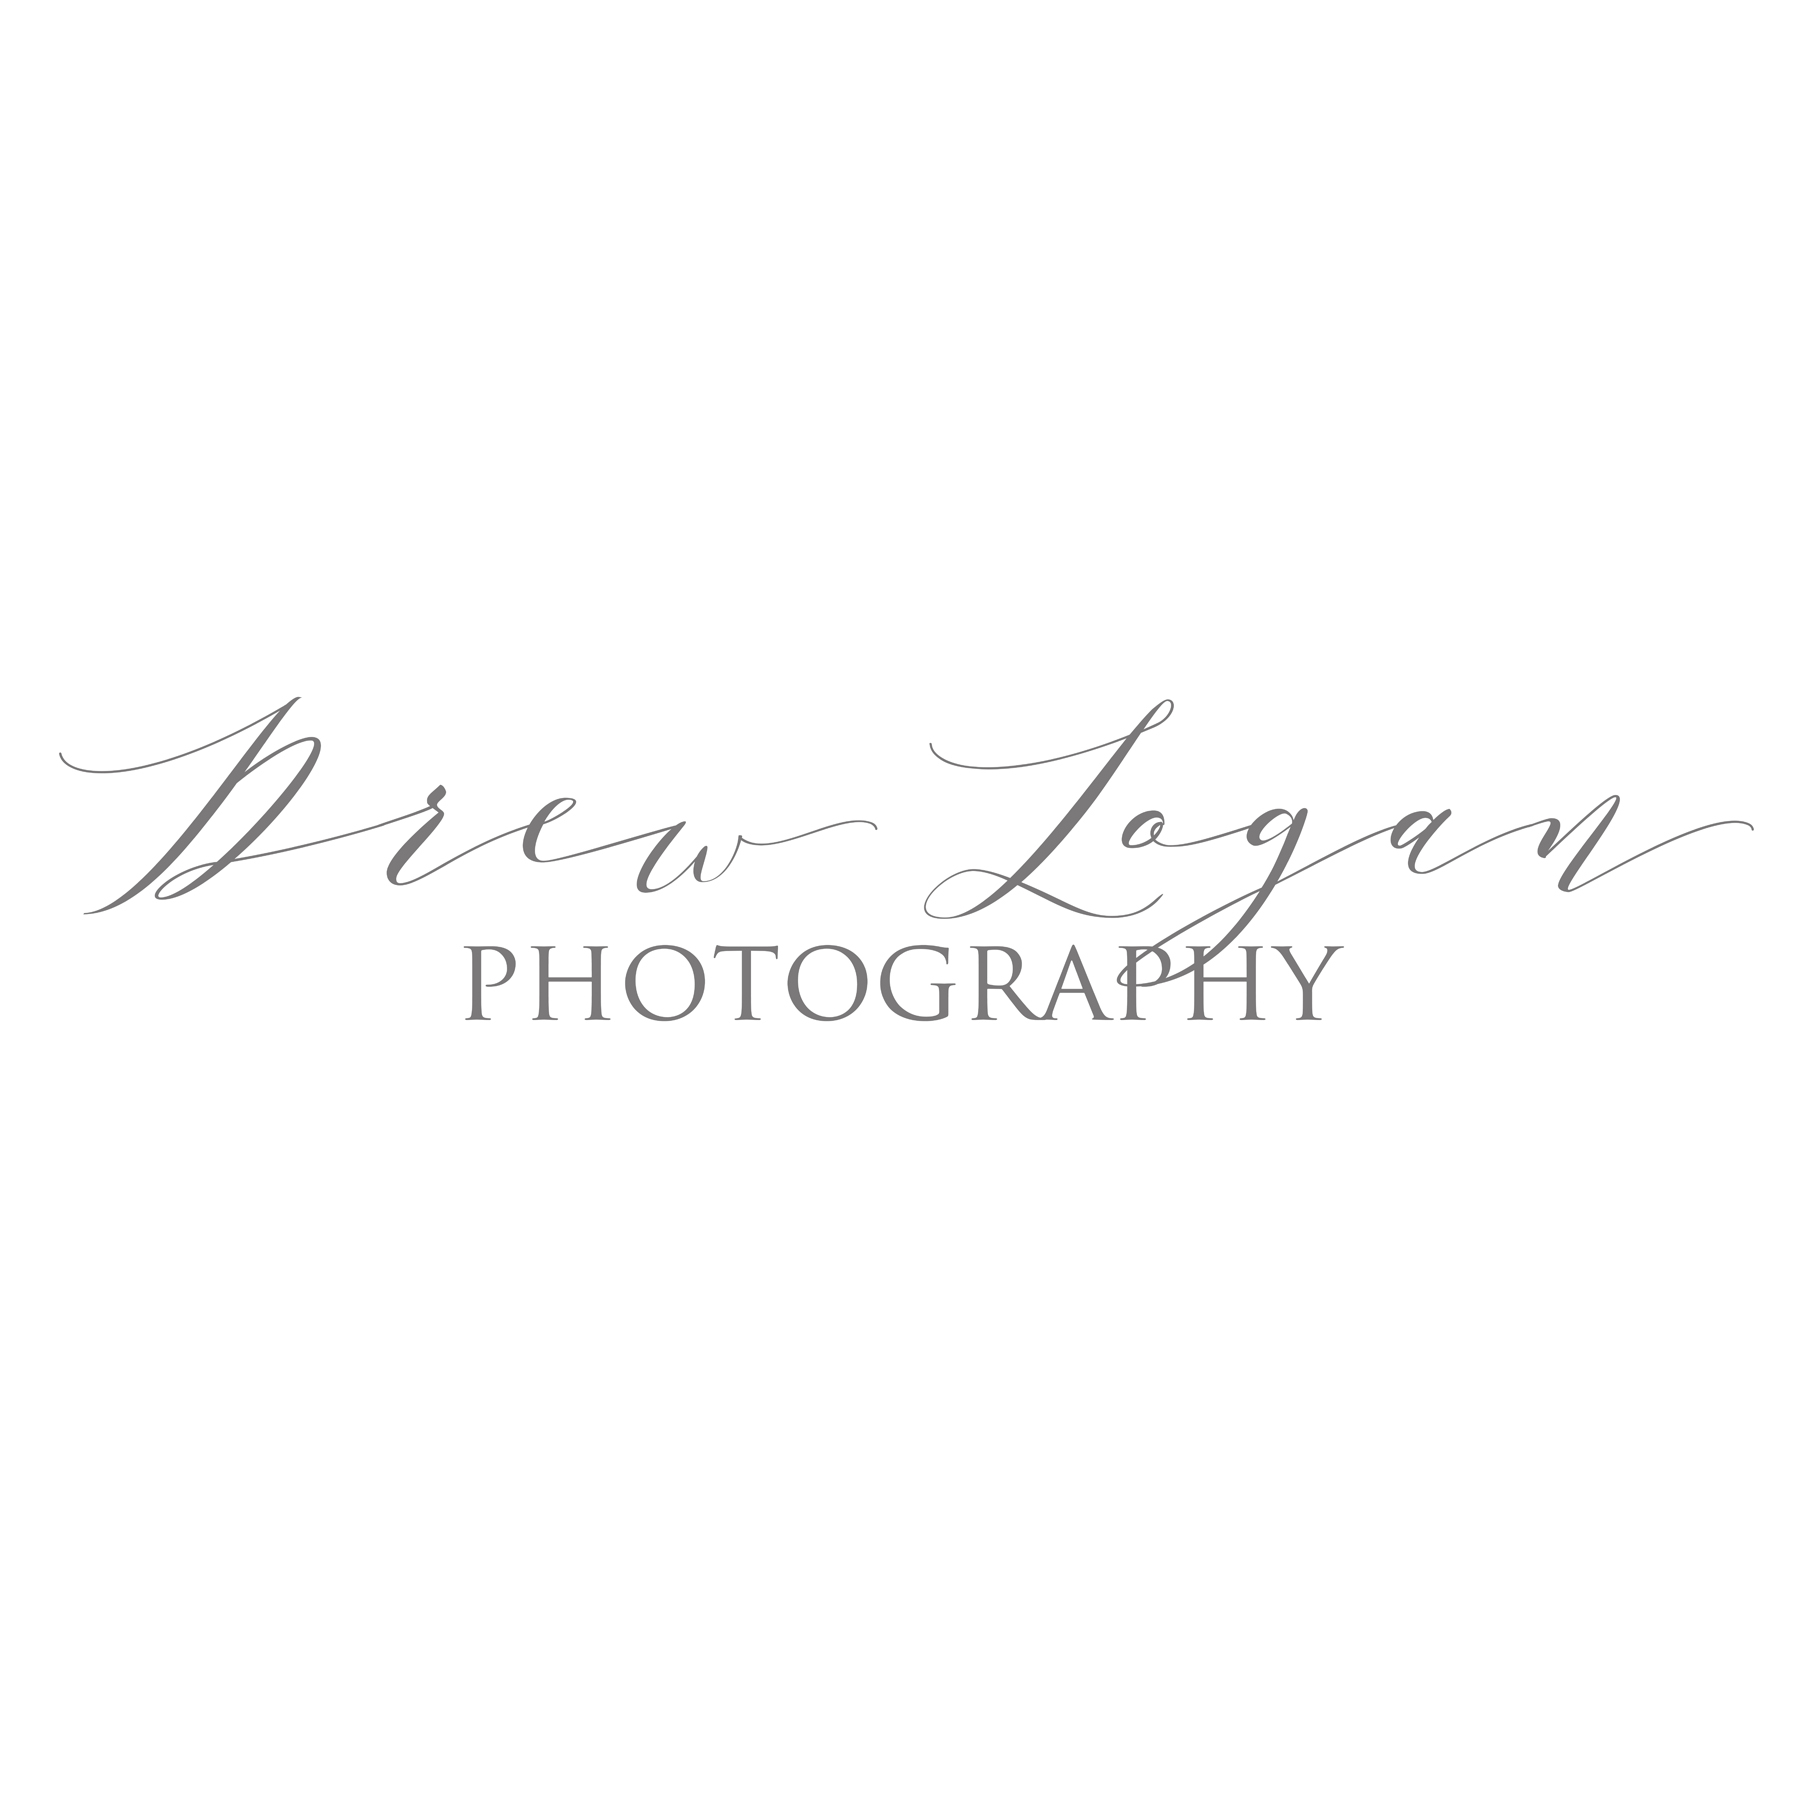 Drew Logan Photography